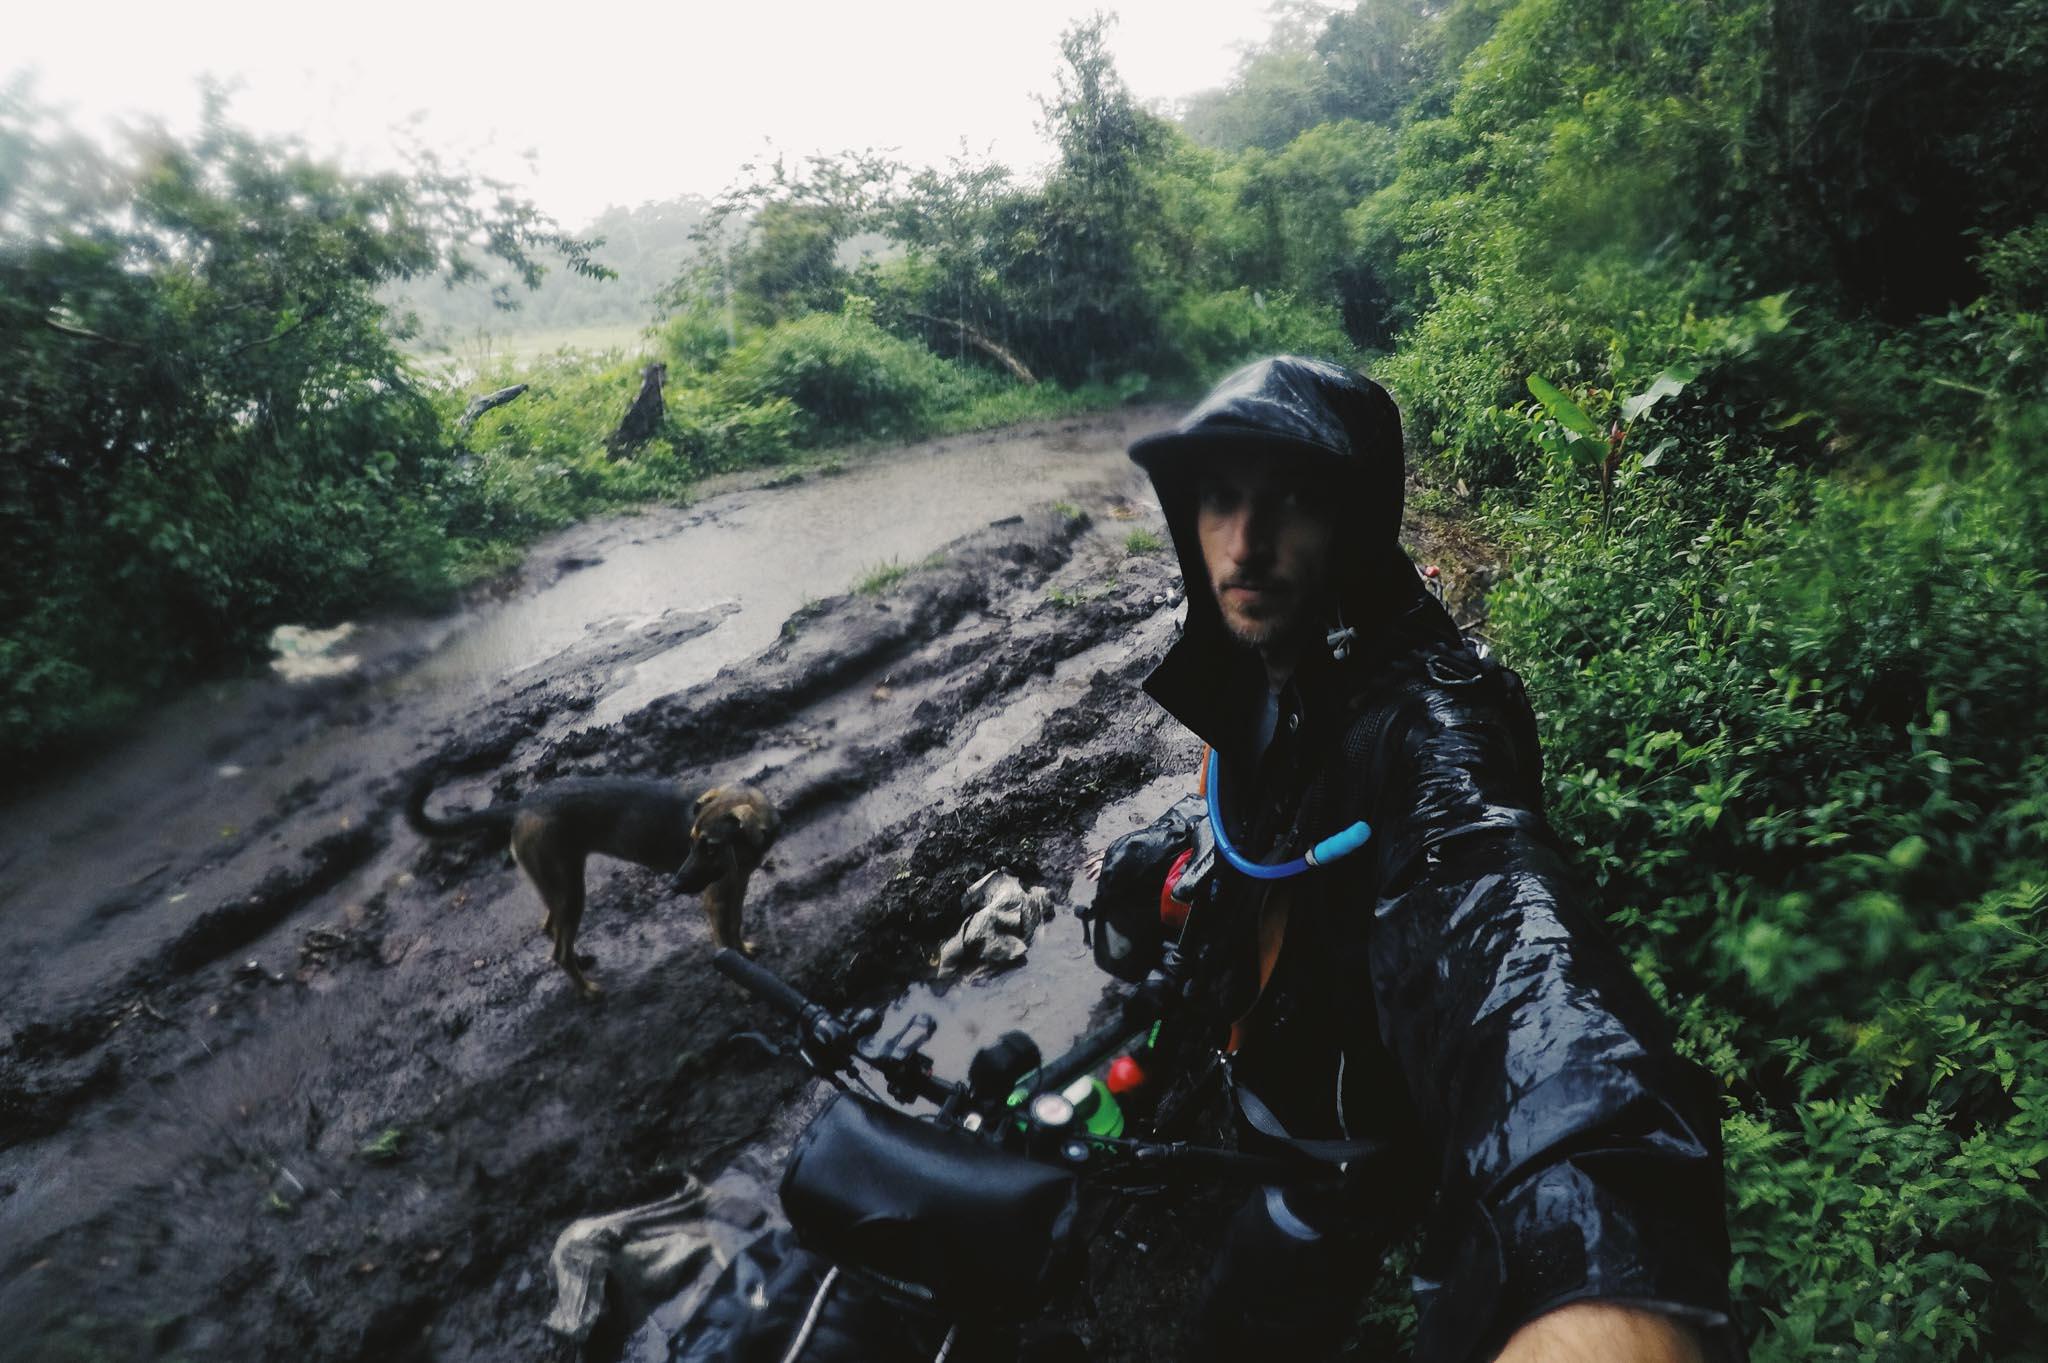 Mud, mud and mud